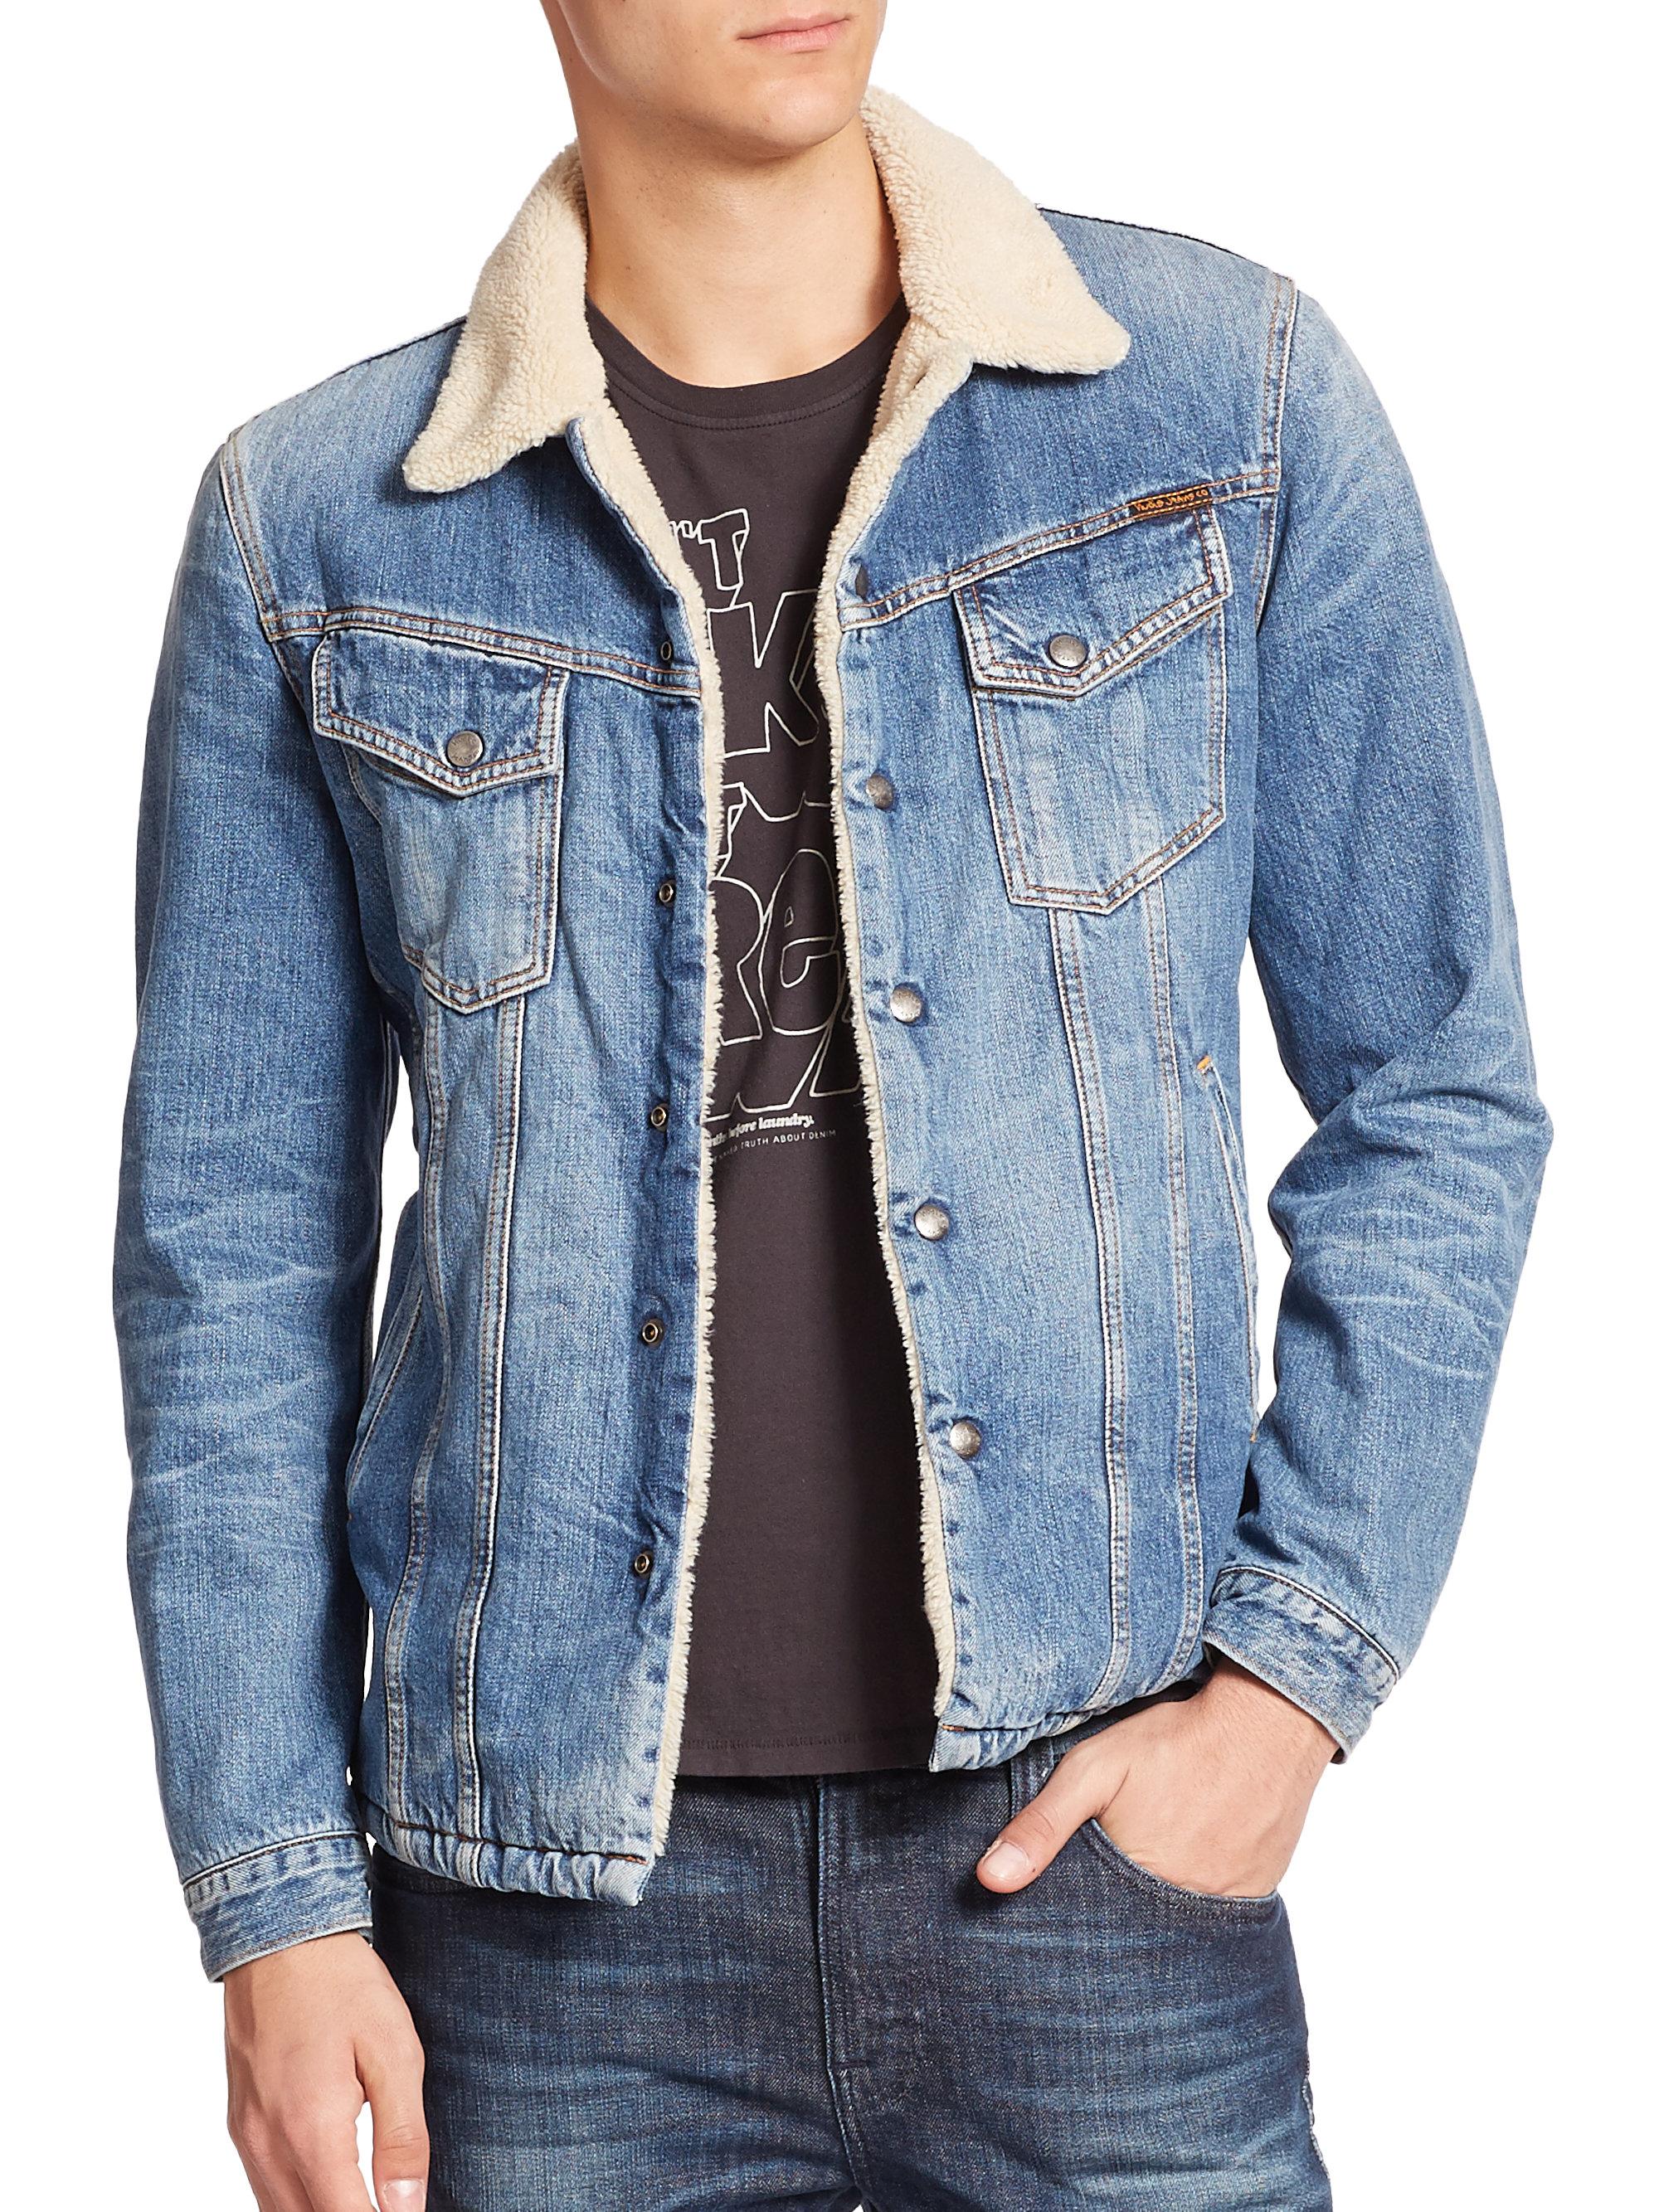 24f9a82ea6 Nudie Jeans Lenny Denim Jacket in Blue for Men - Lyst